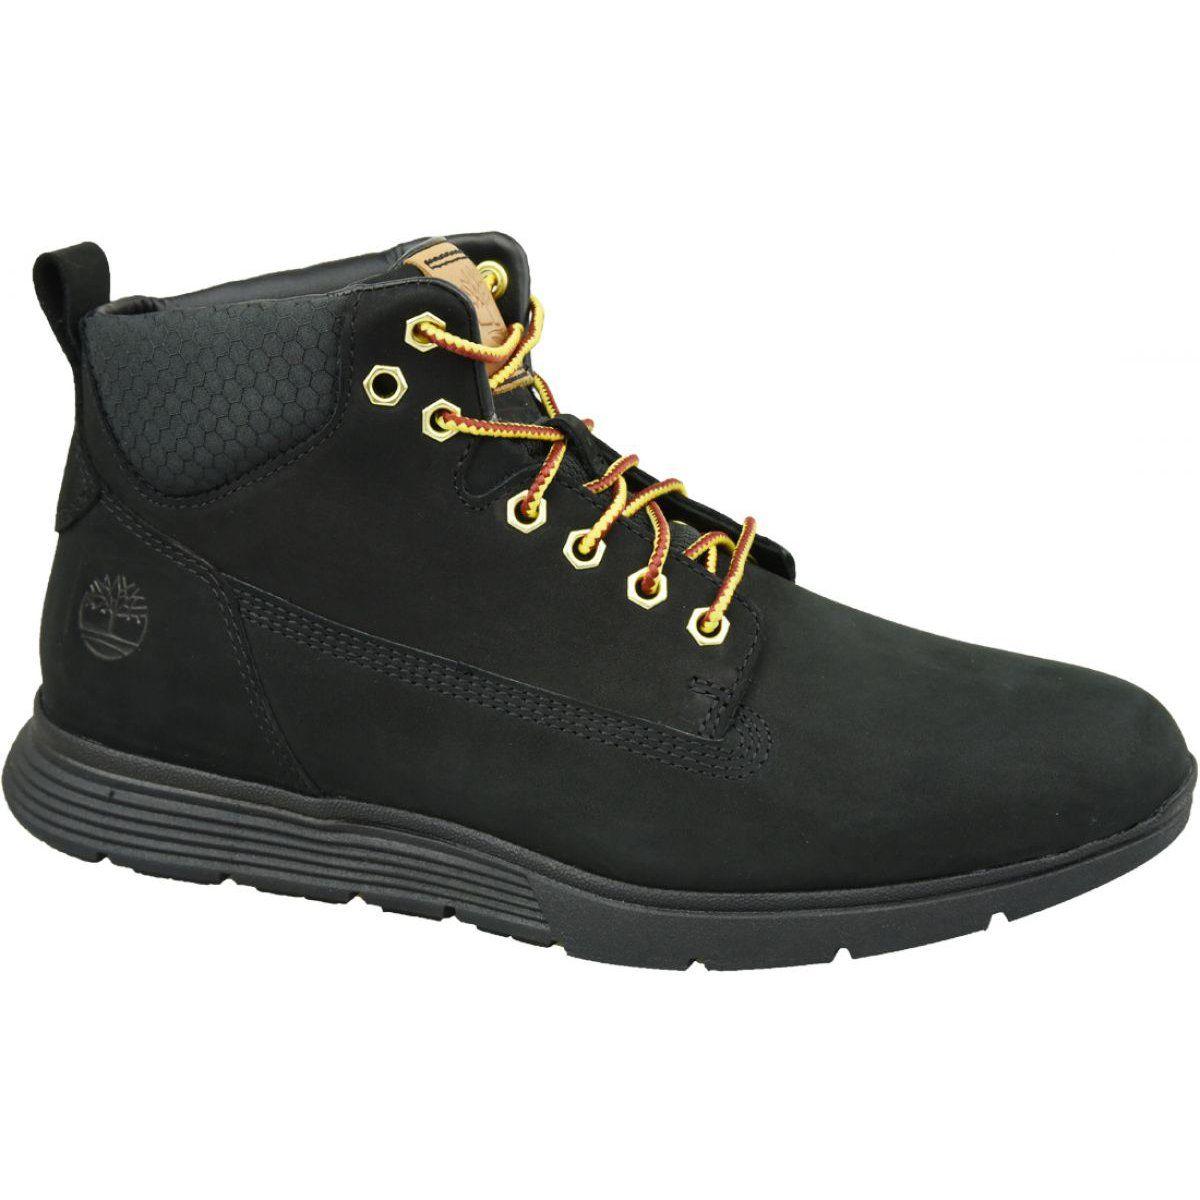 Buty Timberland Killington Chukka M A19uk Czarne Szare Killington Chukka Sport Shoes Men Comfortable Shoes